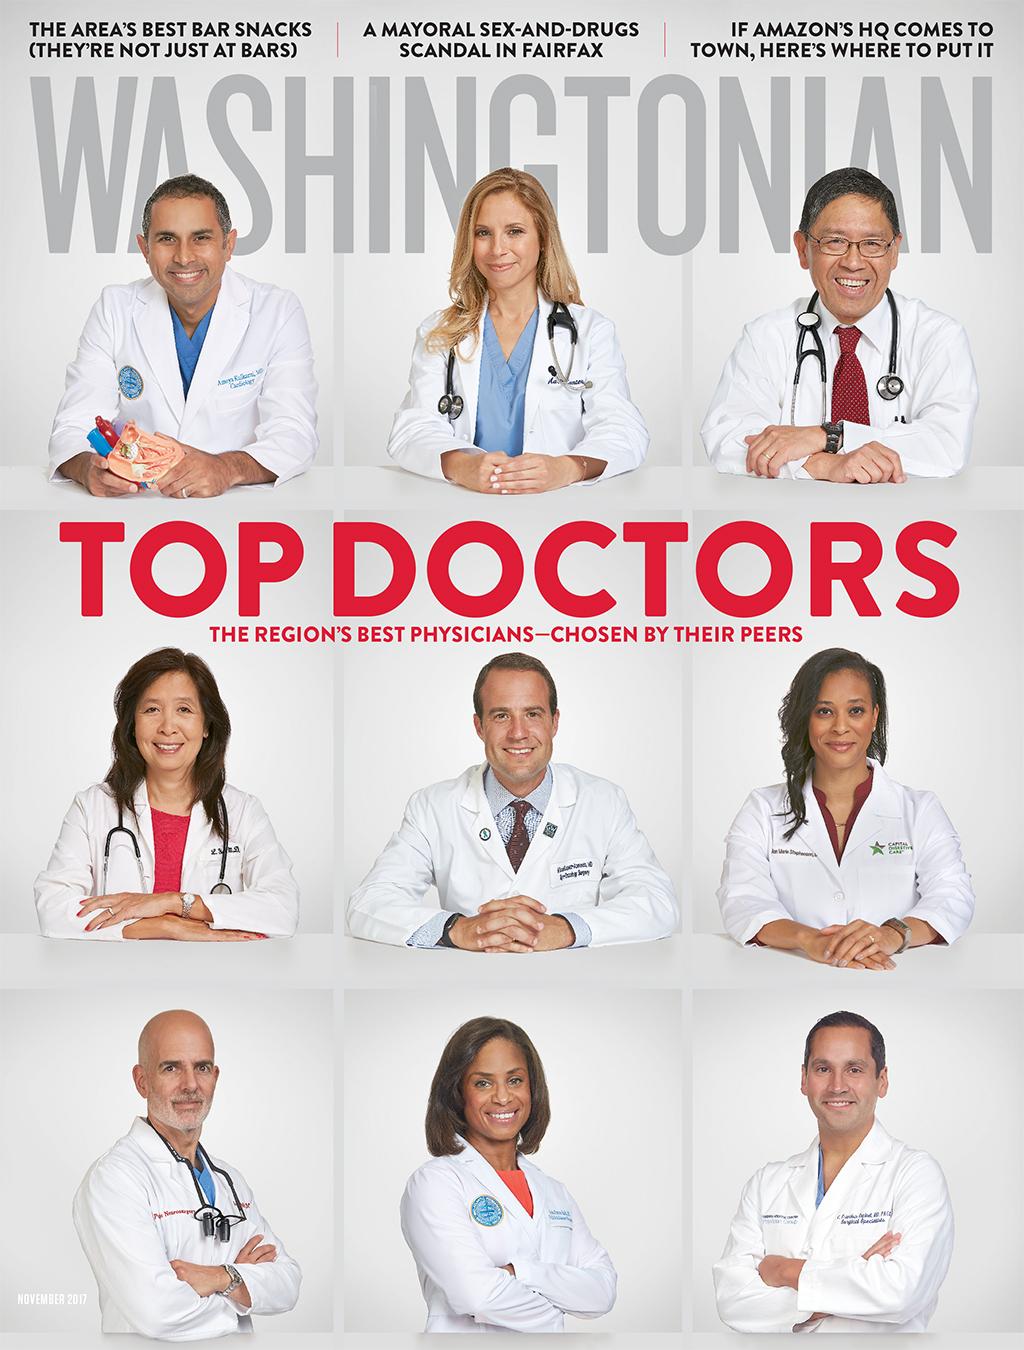 Washingtonian Top Doctors 2015 cover